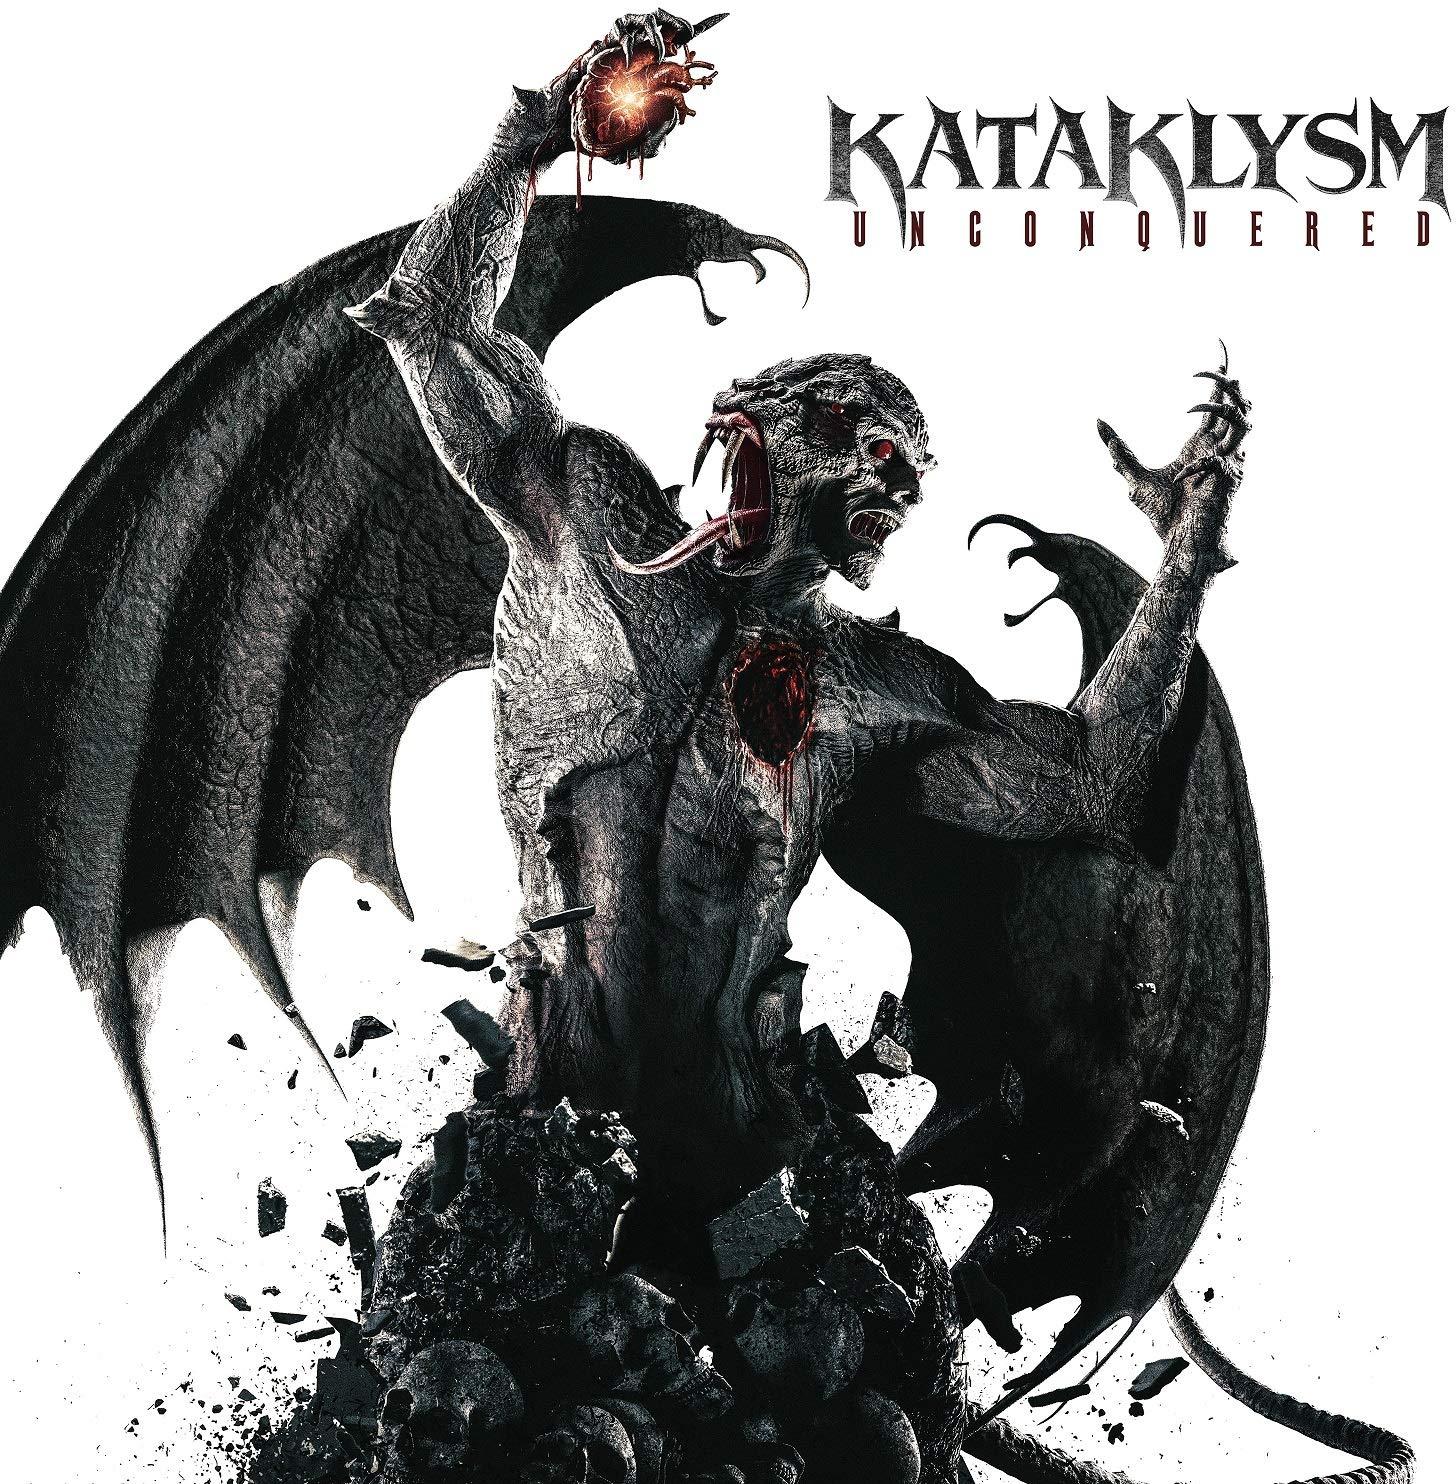 KATAKLYSM - Unconquered - Amazon.com Music